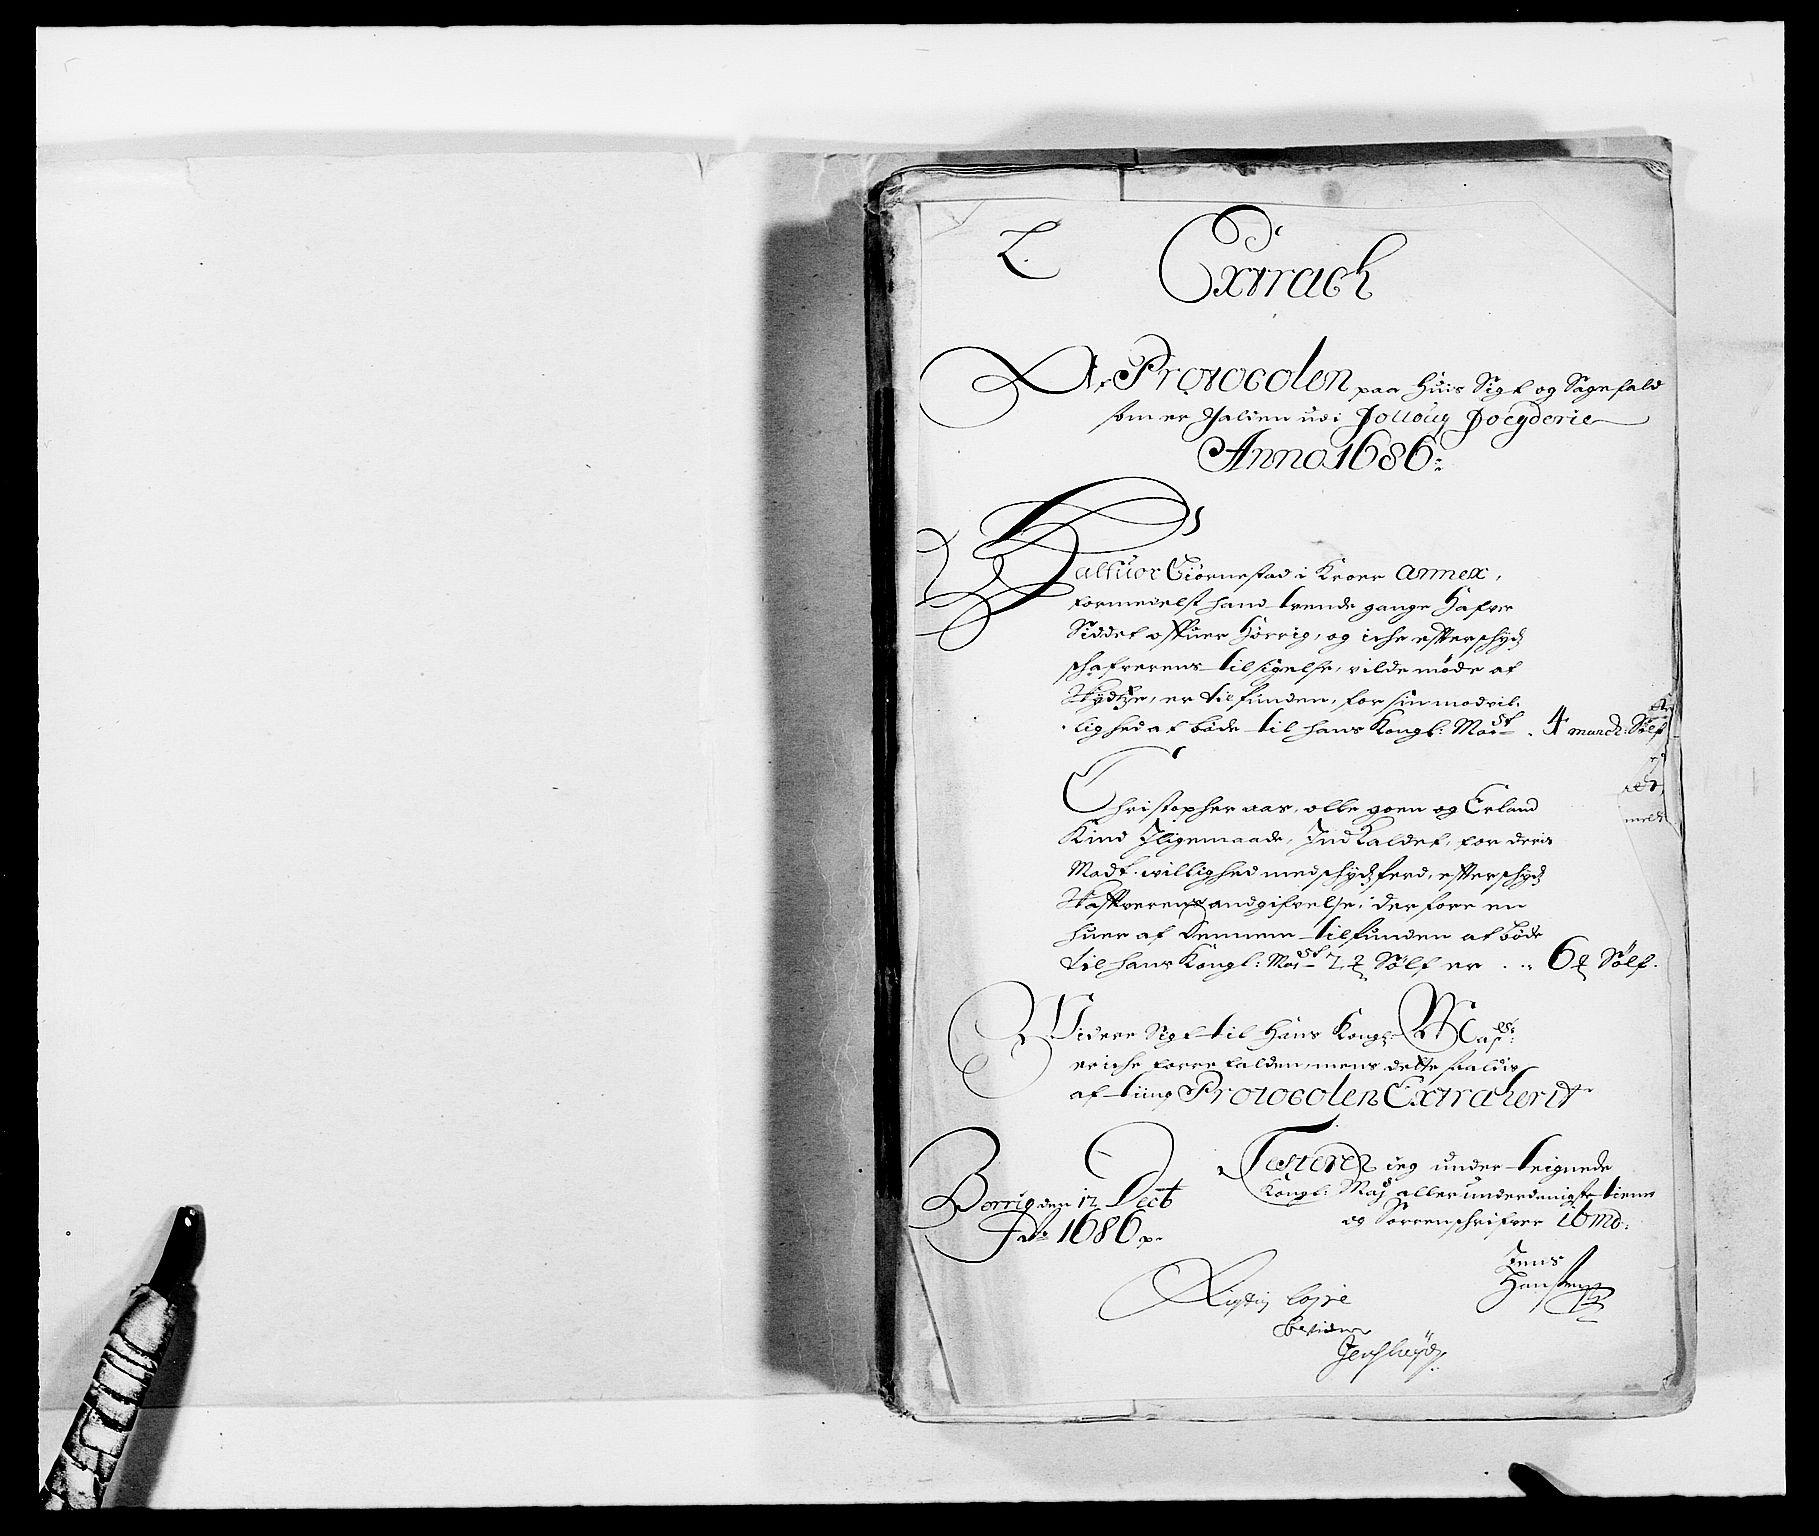 RA, Rentekammeret inntil 1814, Reviderte regnskaper, Fogderegnskap, R09/L0433: Fogderegnskap Follo, 1685-1686, s. 244